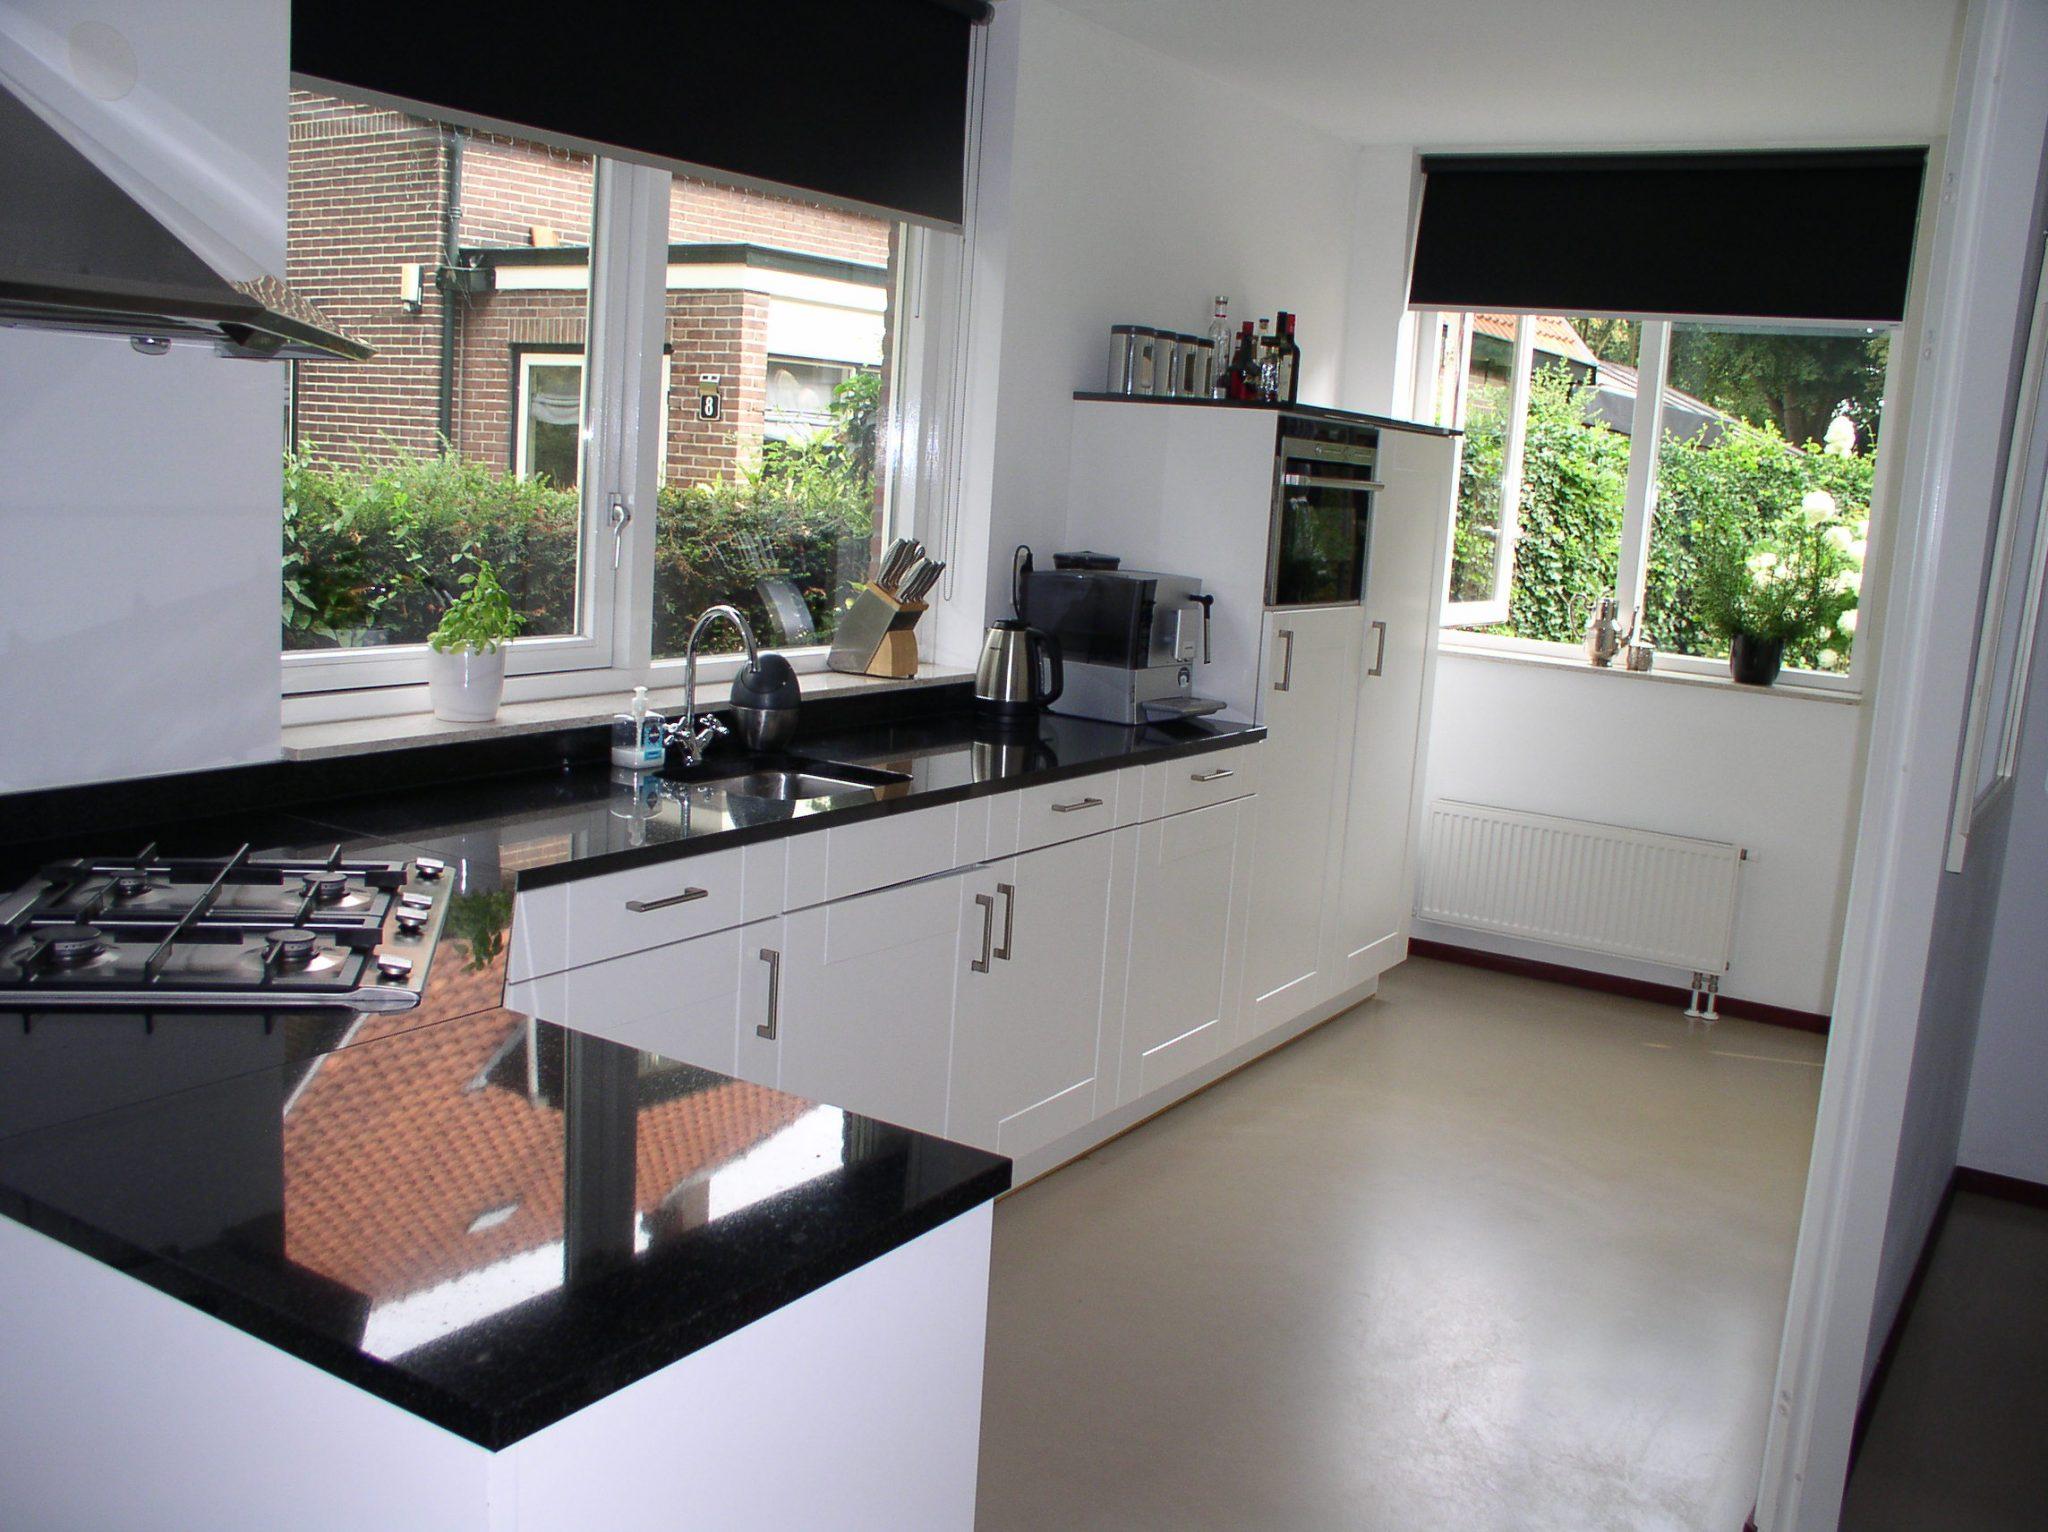 Moderne L Keuken : Moderne witte l keuken graniet apparatuur tweedehands keuken